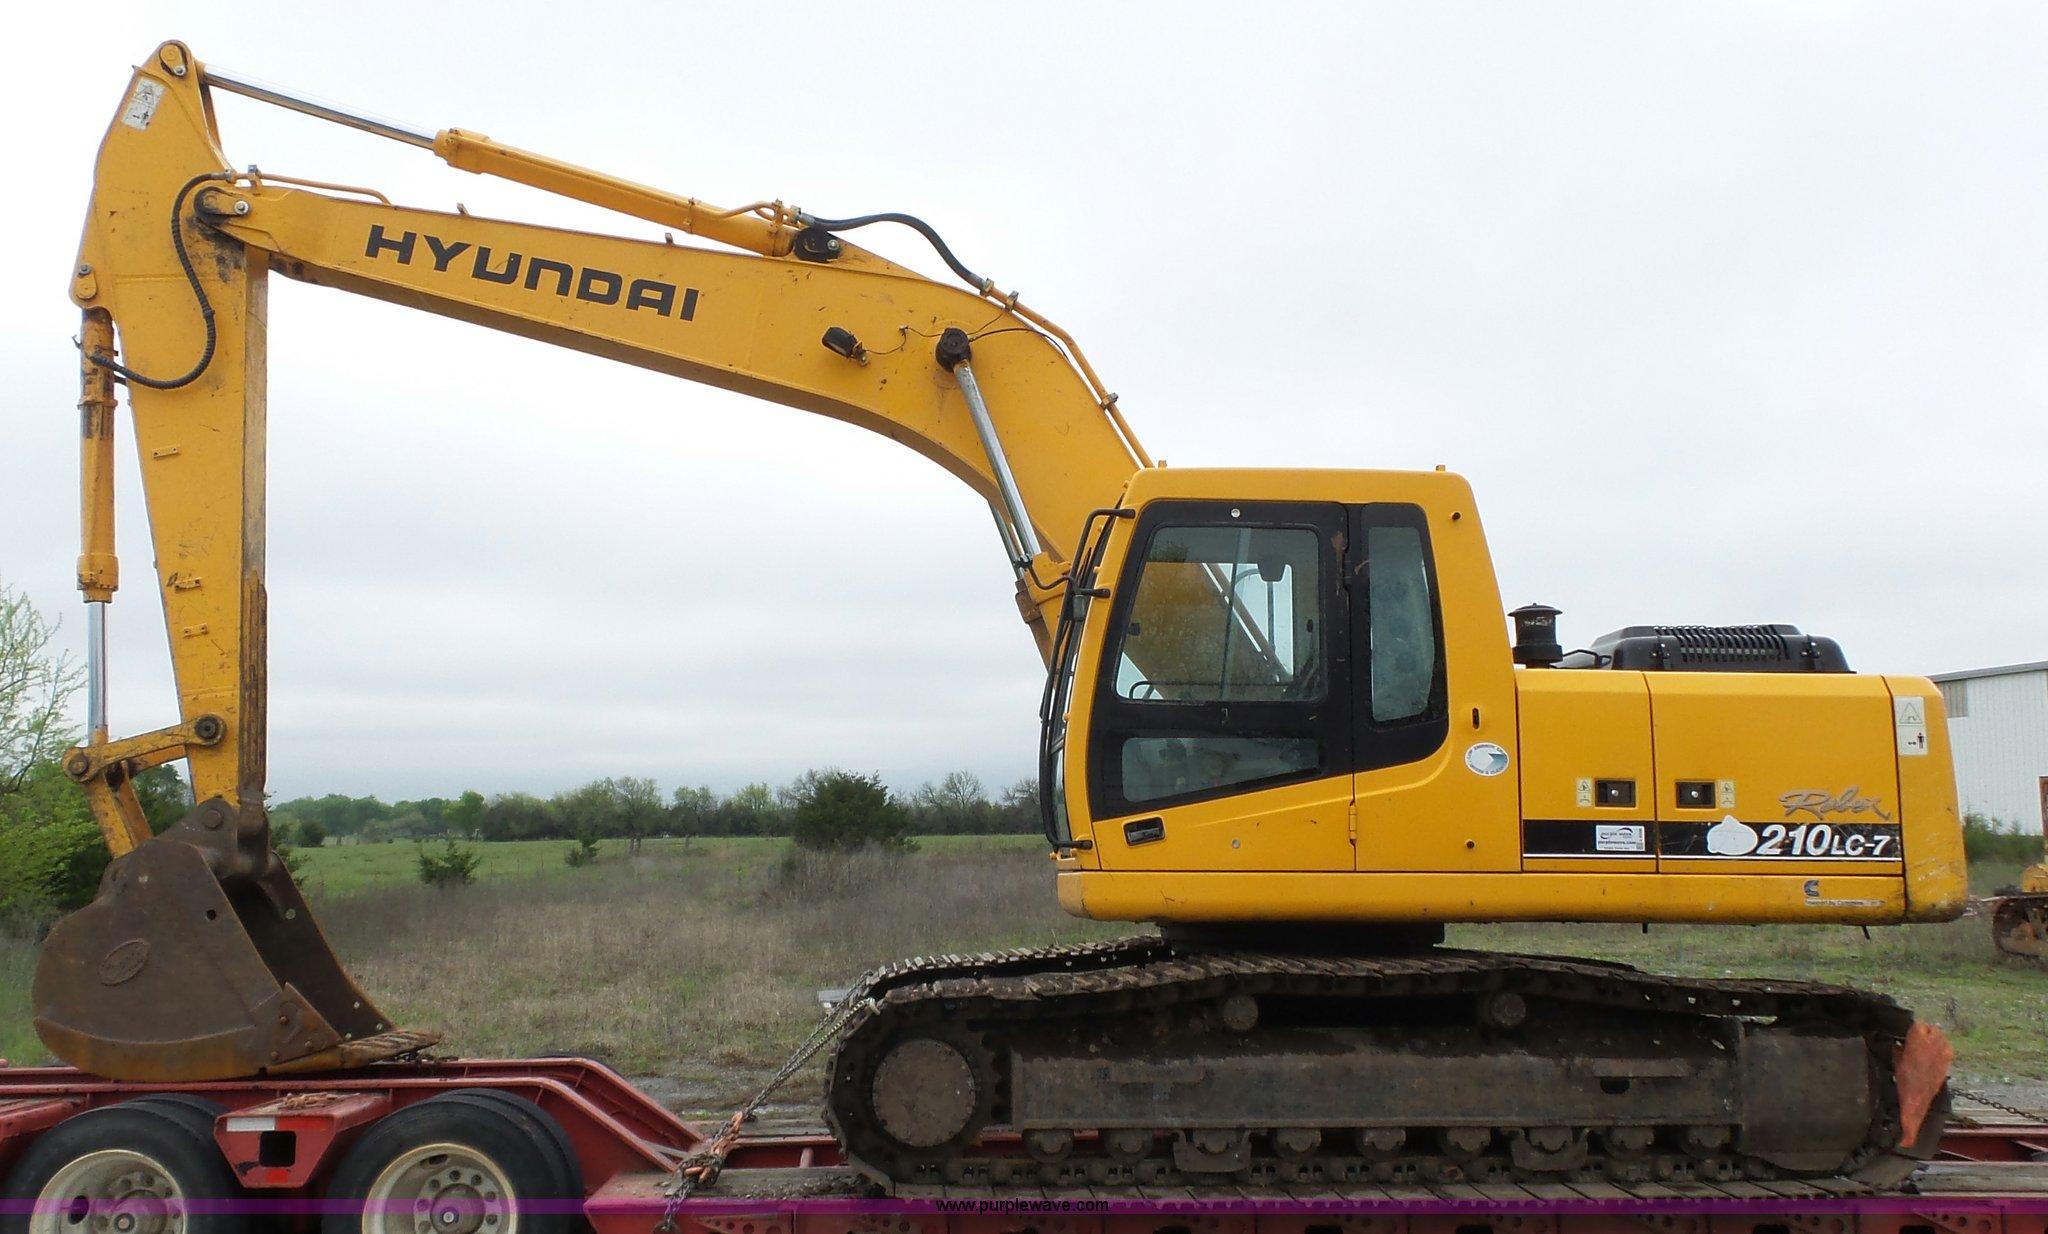 hyundai robex 210lc-7 excavator full size in new window